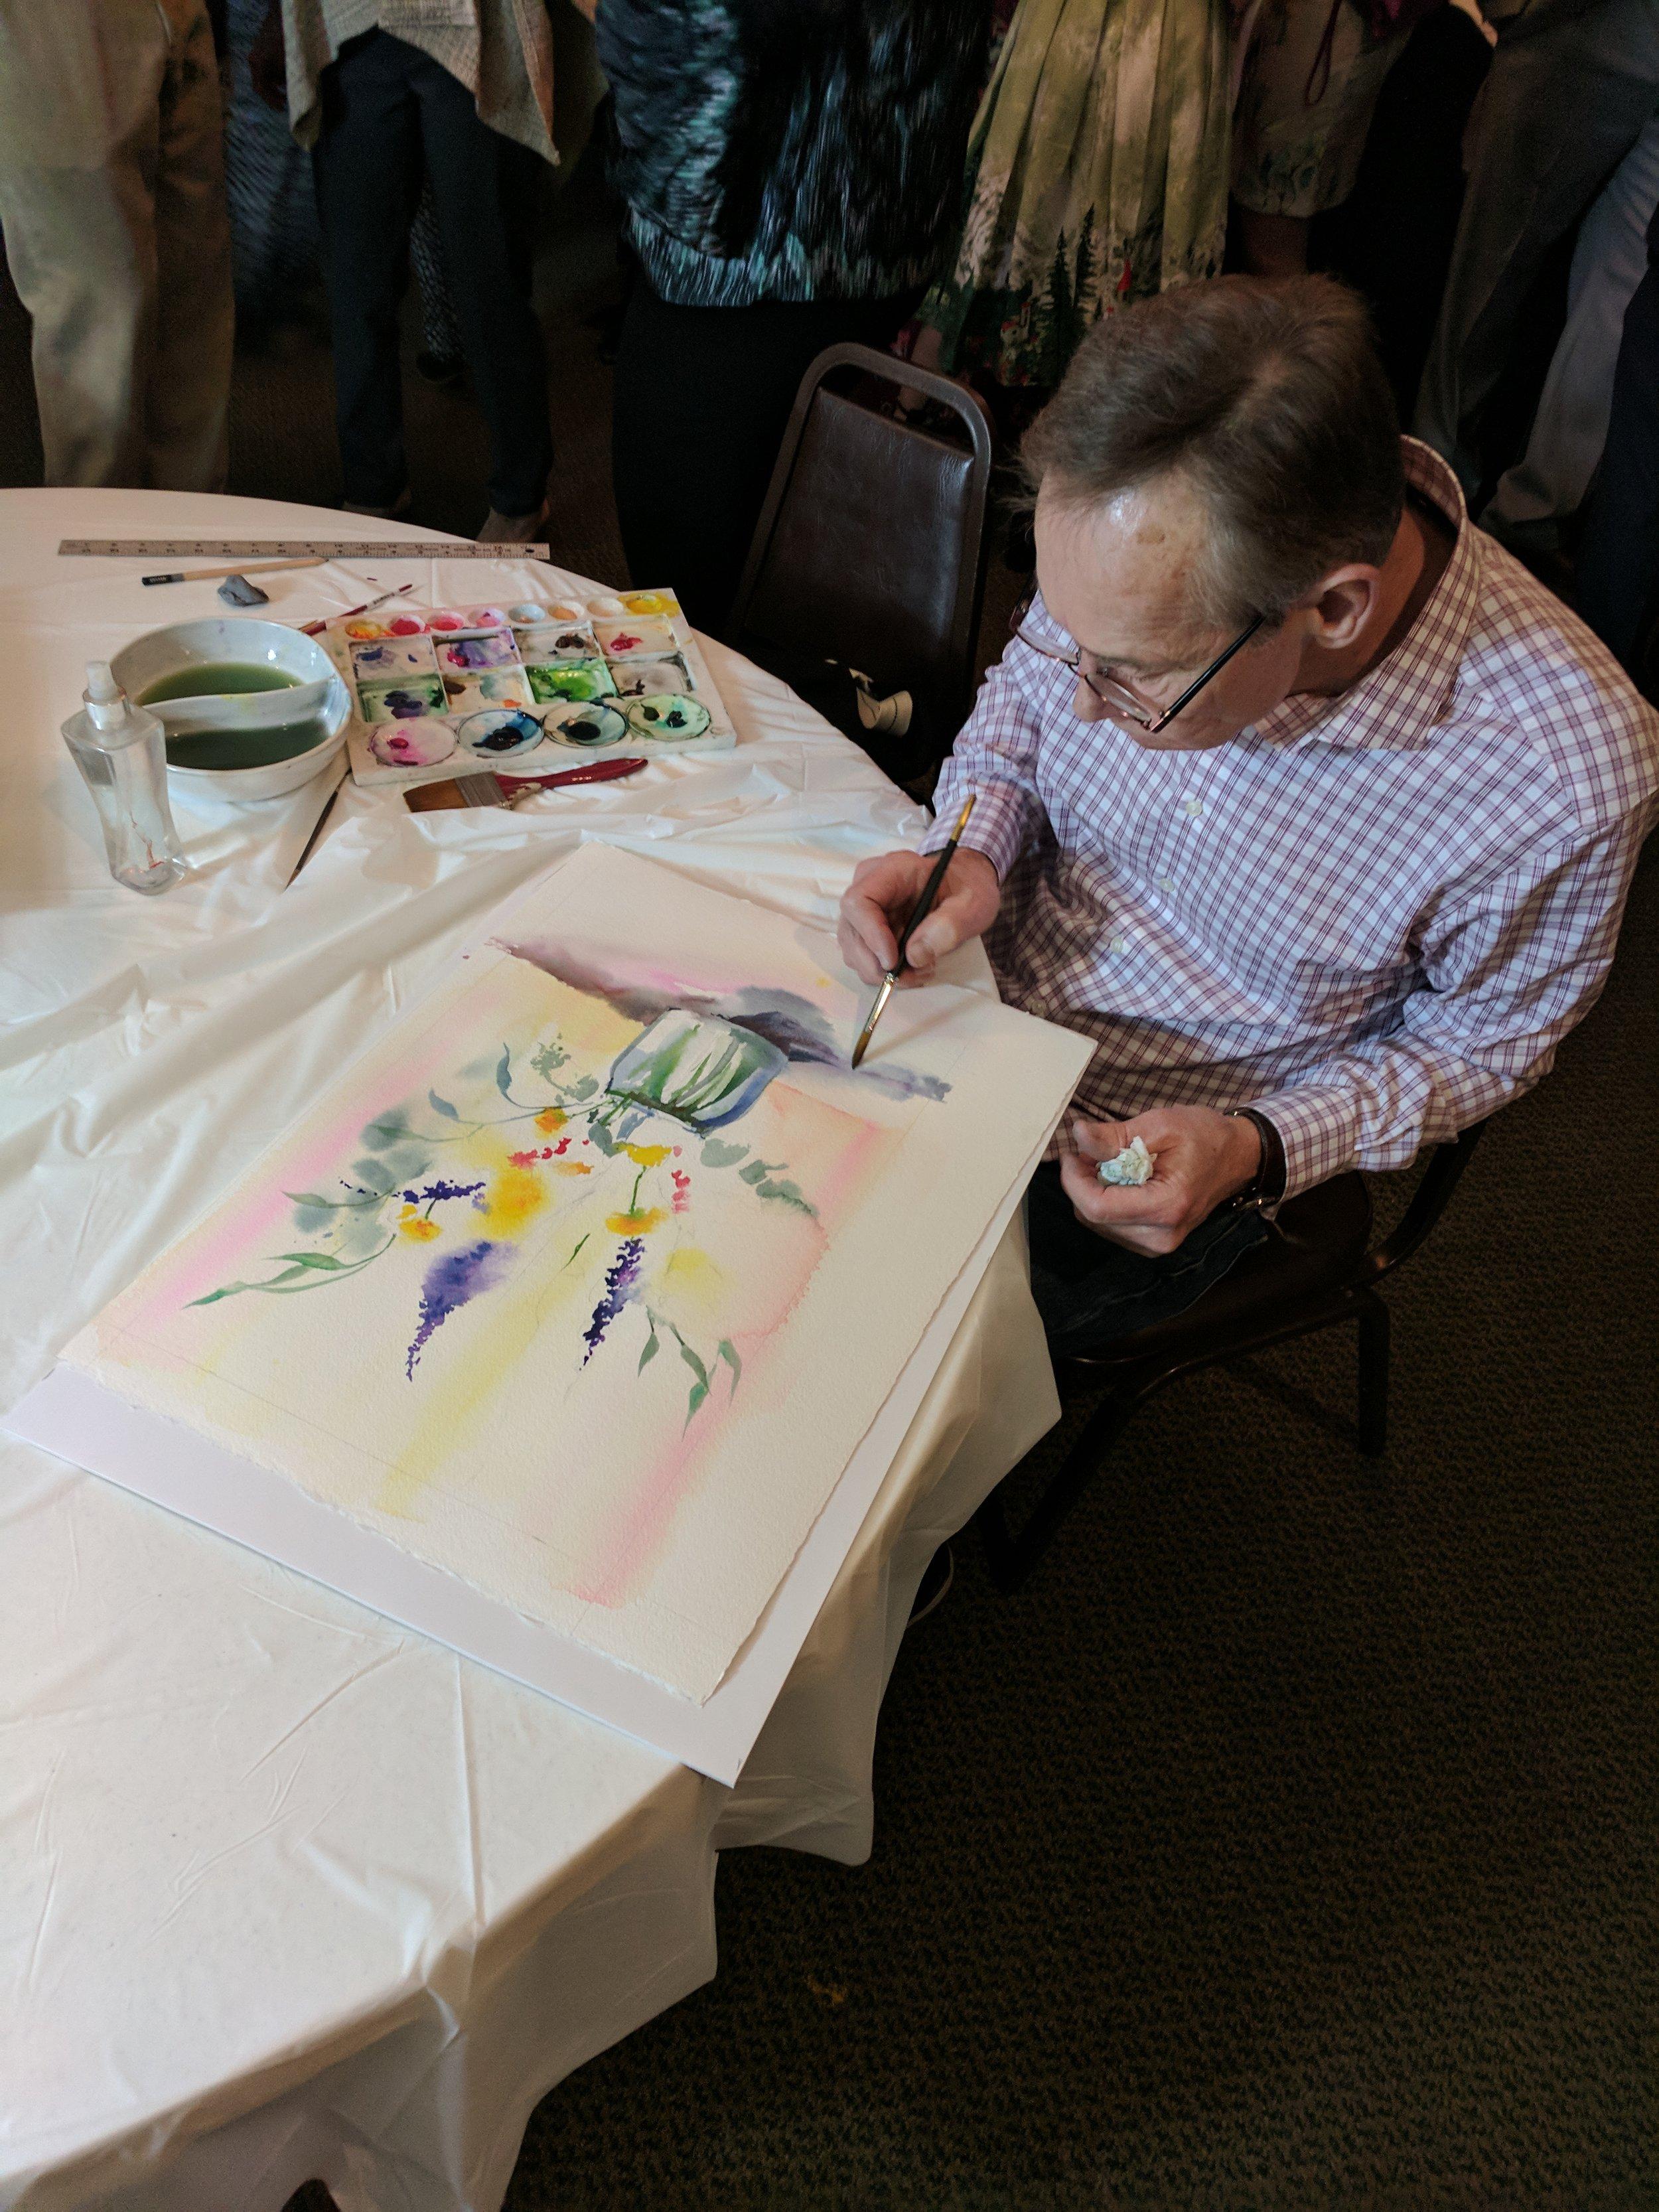 Pete Winklbauer paints a live auction piece at the Annual Gala Fundraiser.